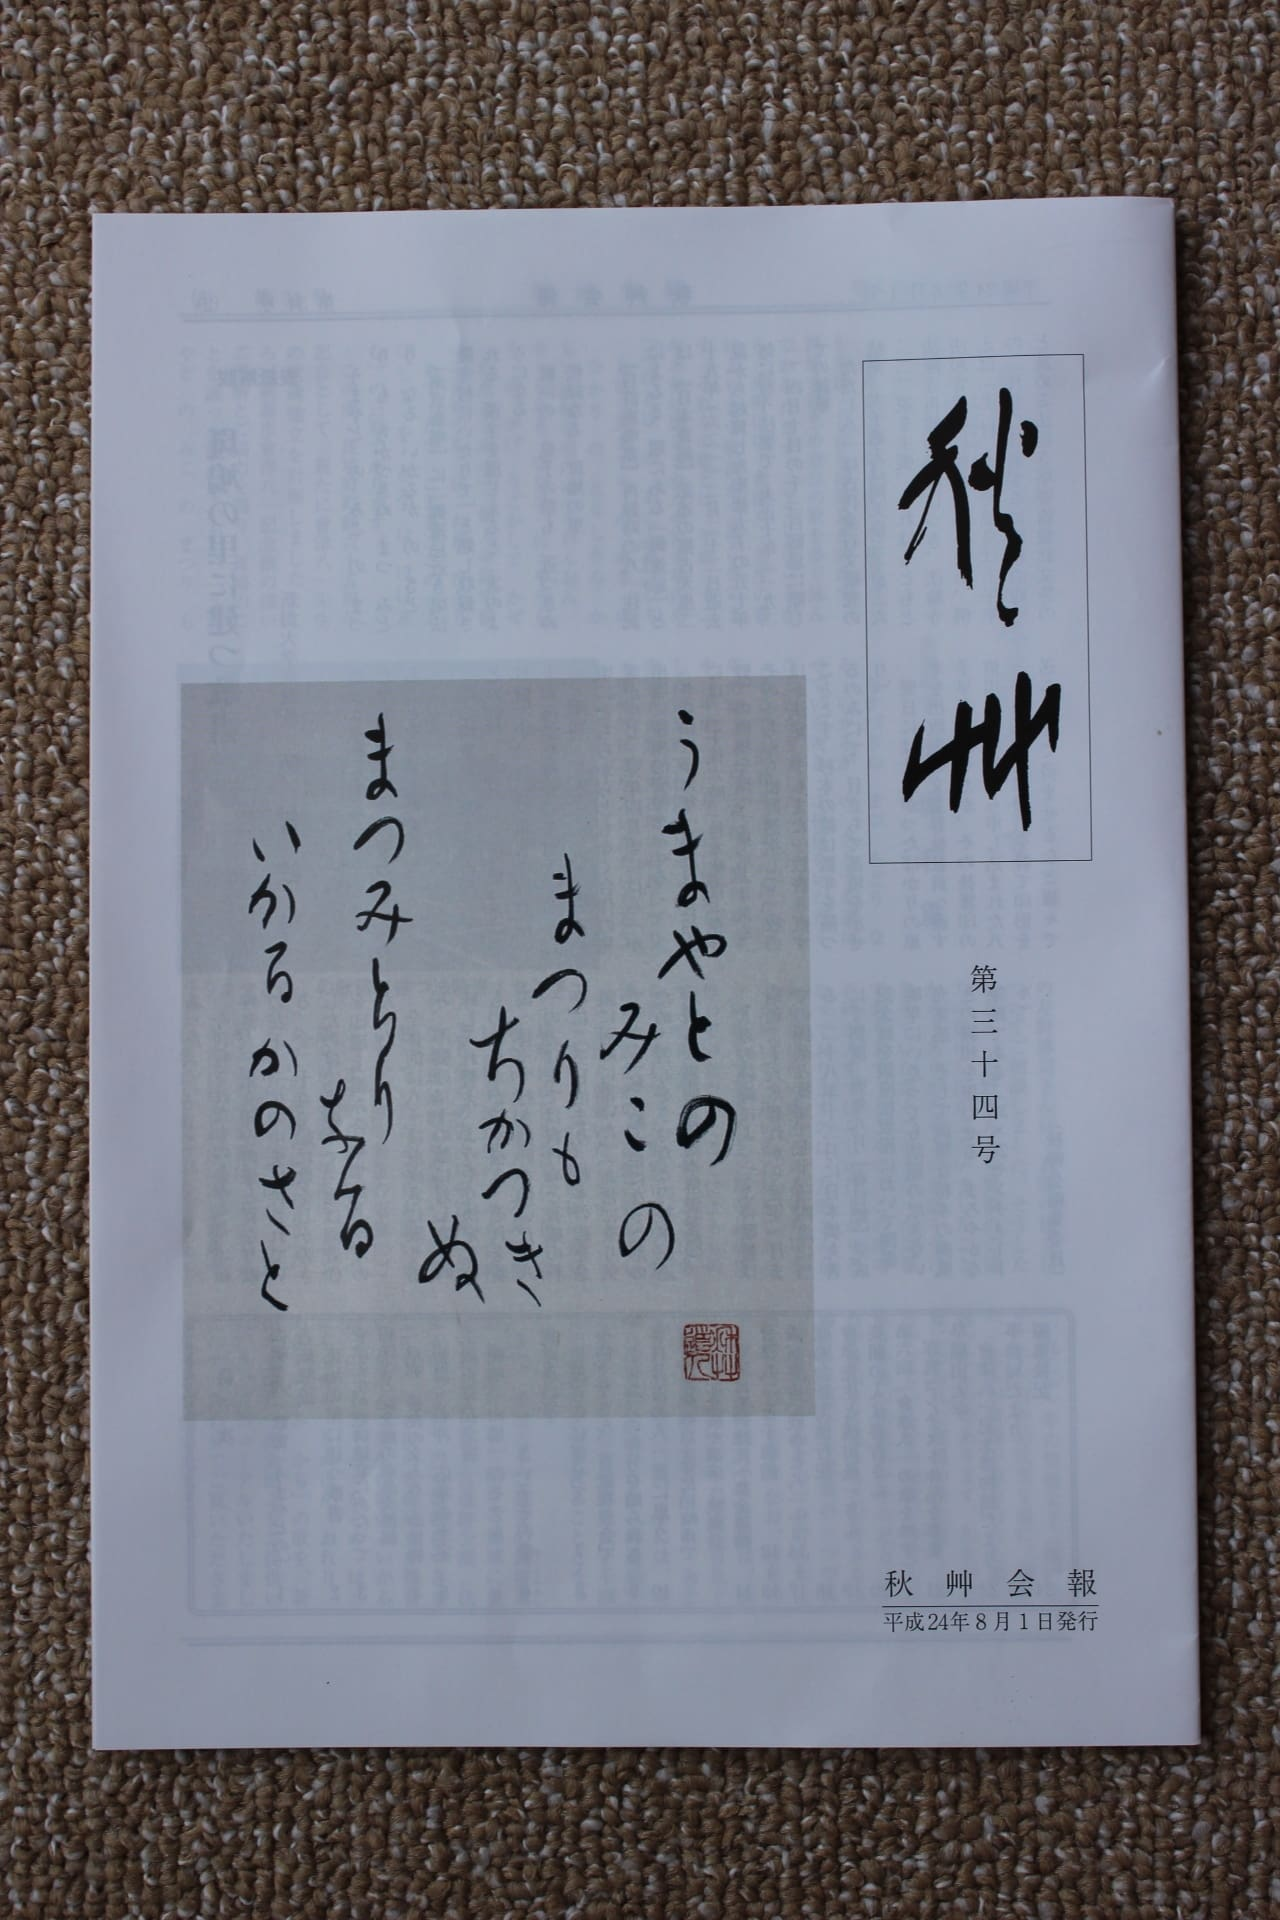 会津八一の画像 p1_11